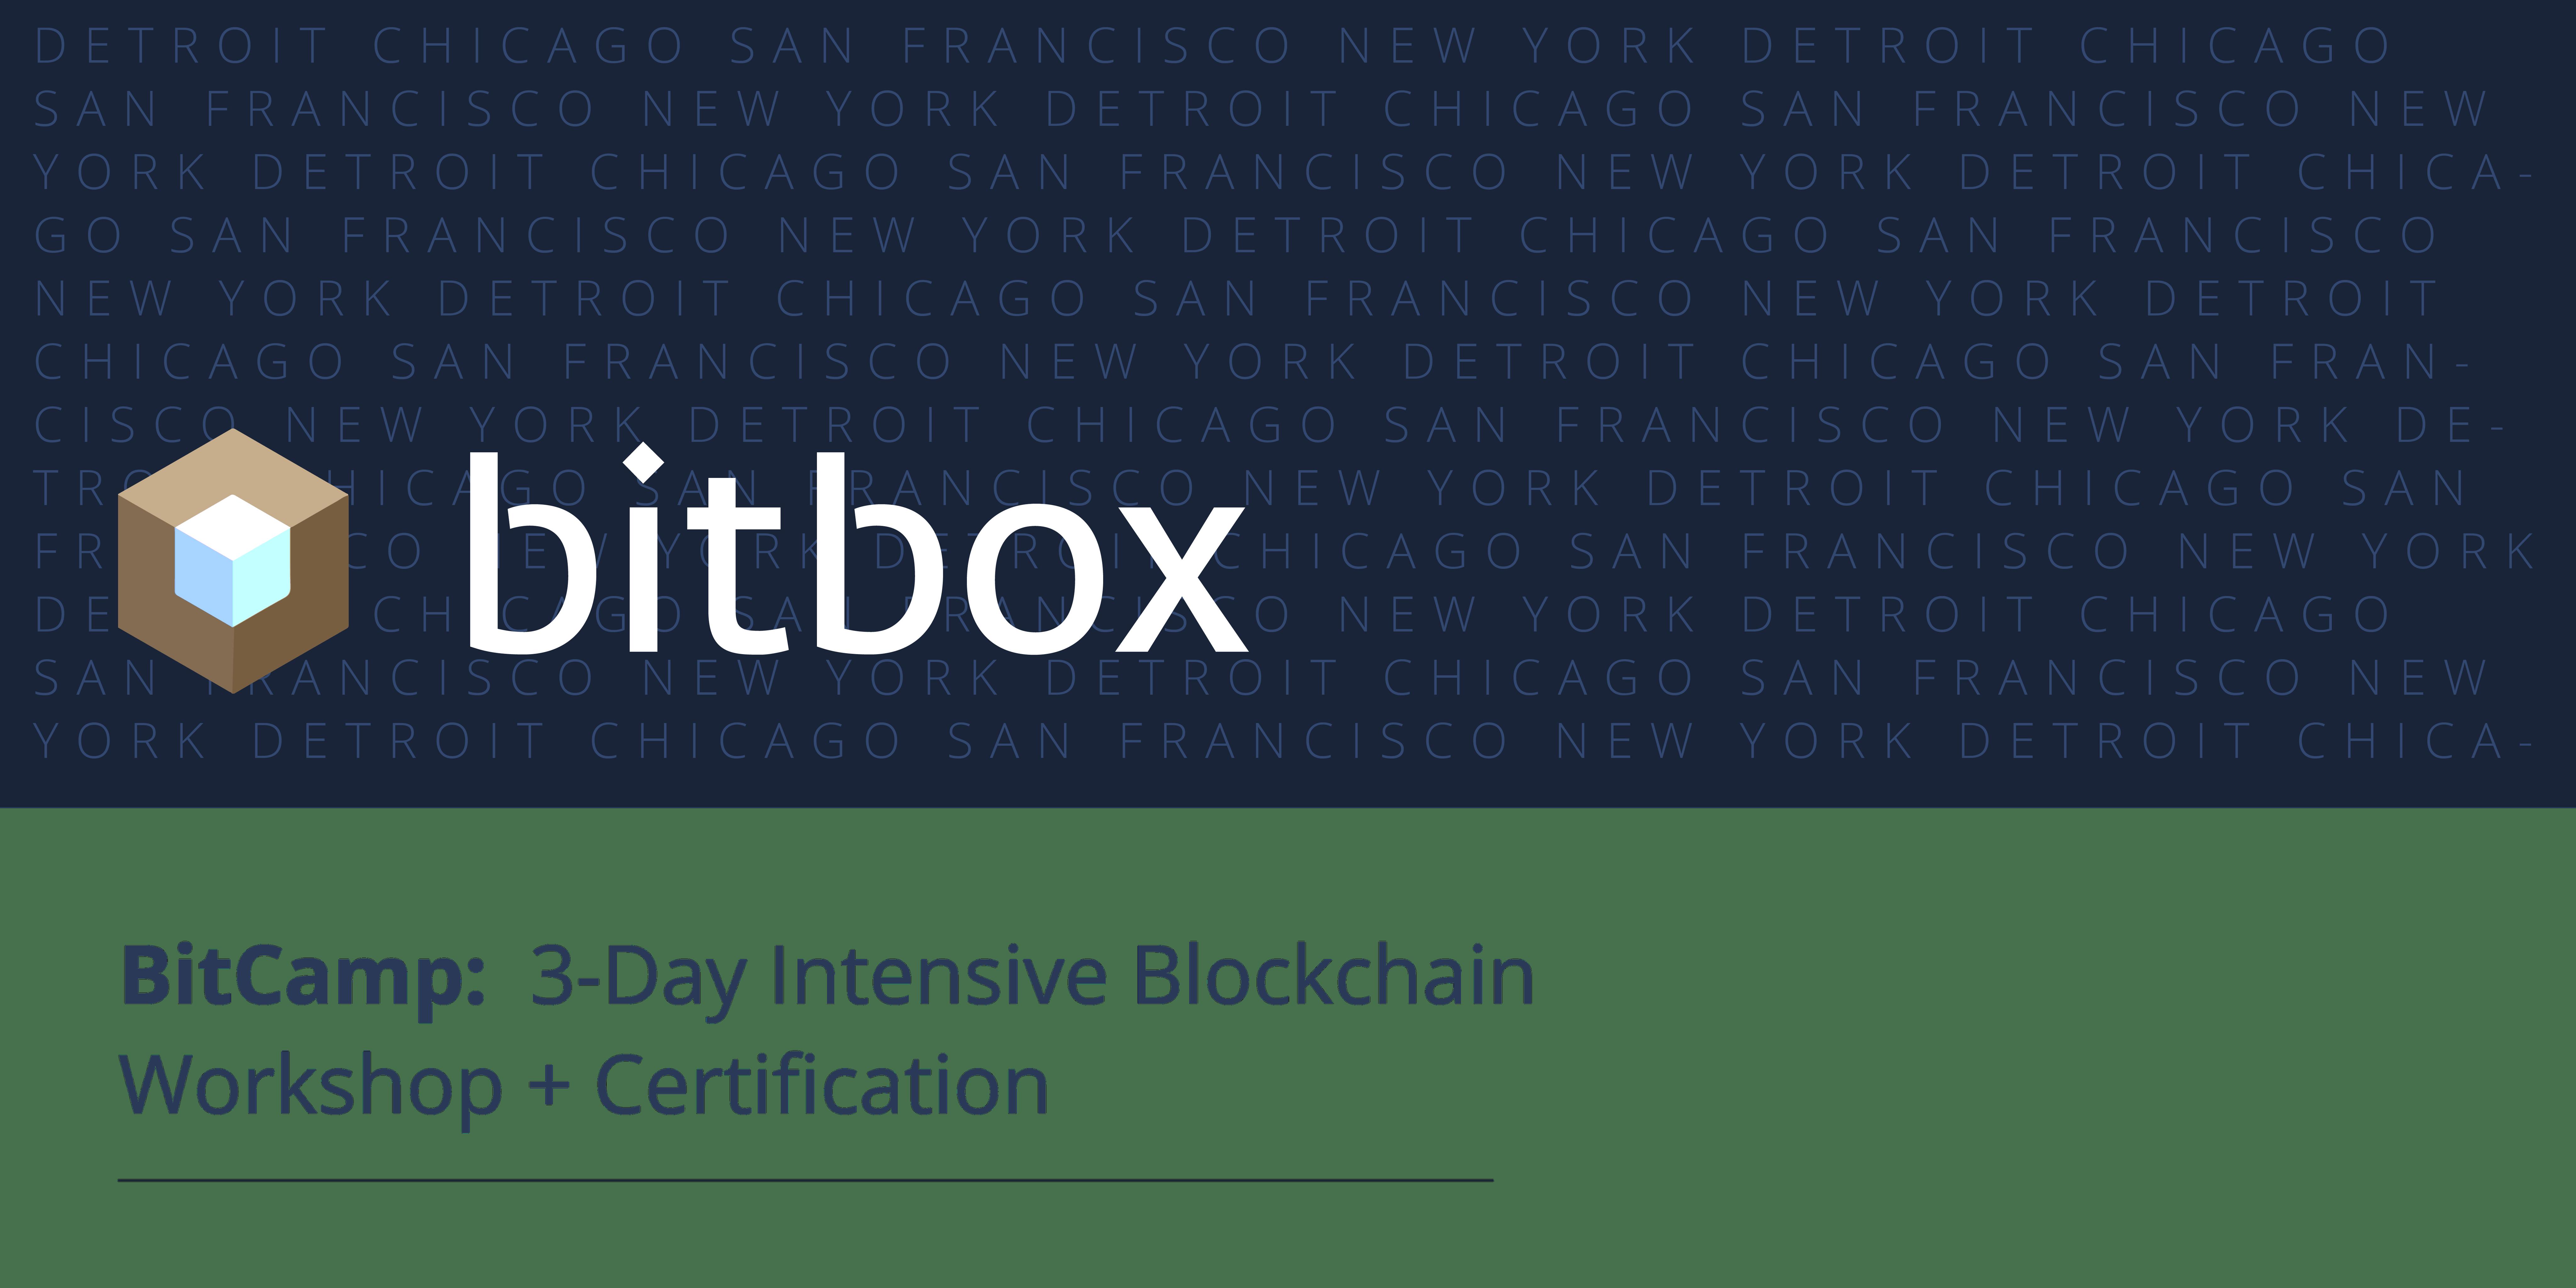 BitCamp Chicago 3-day intensive Blockchain Executive Workshop